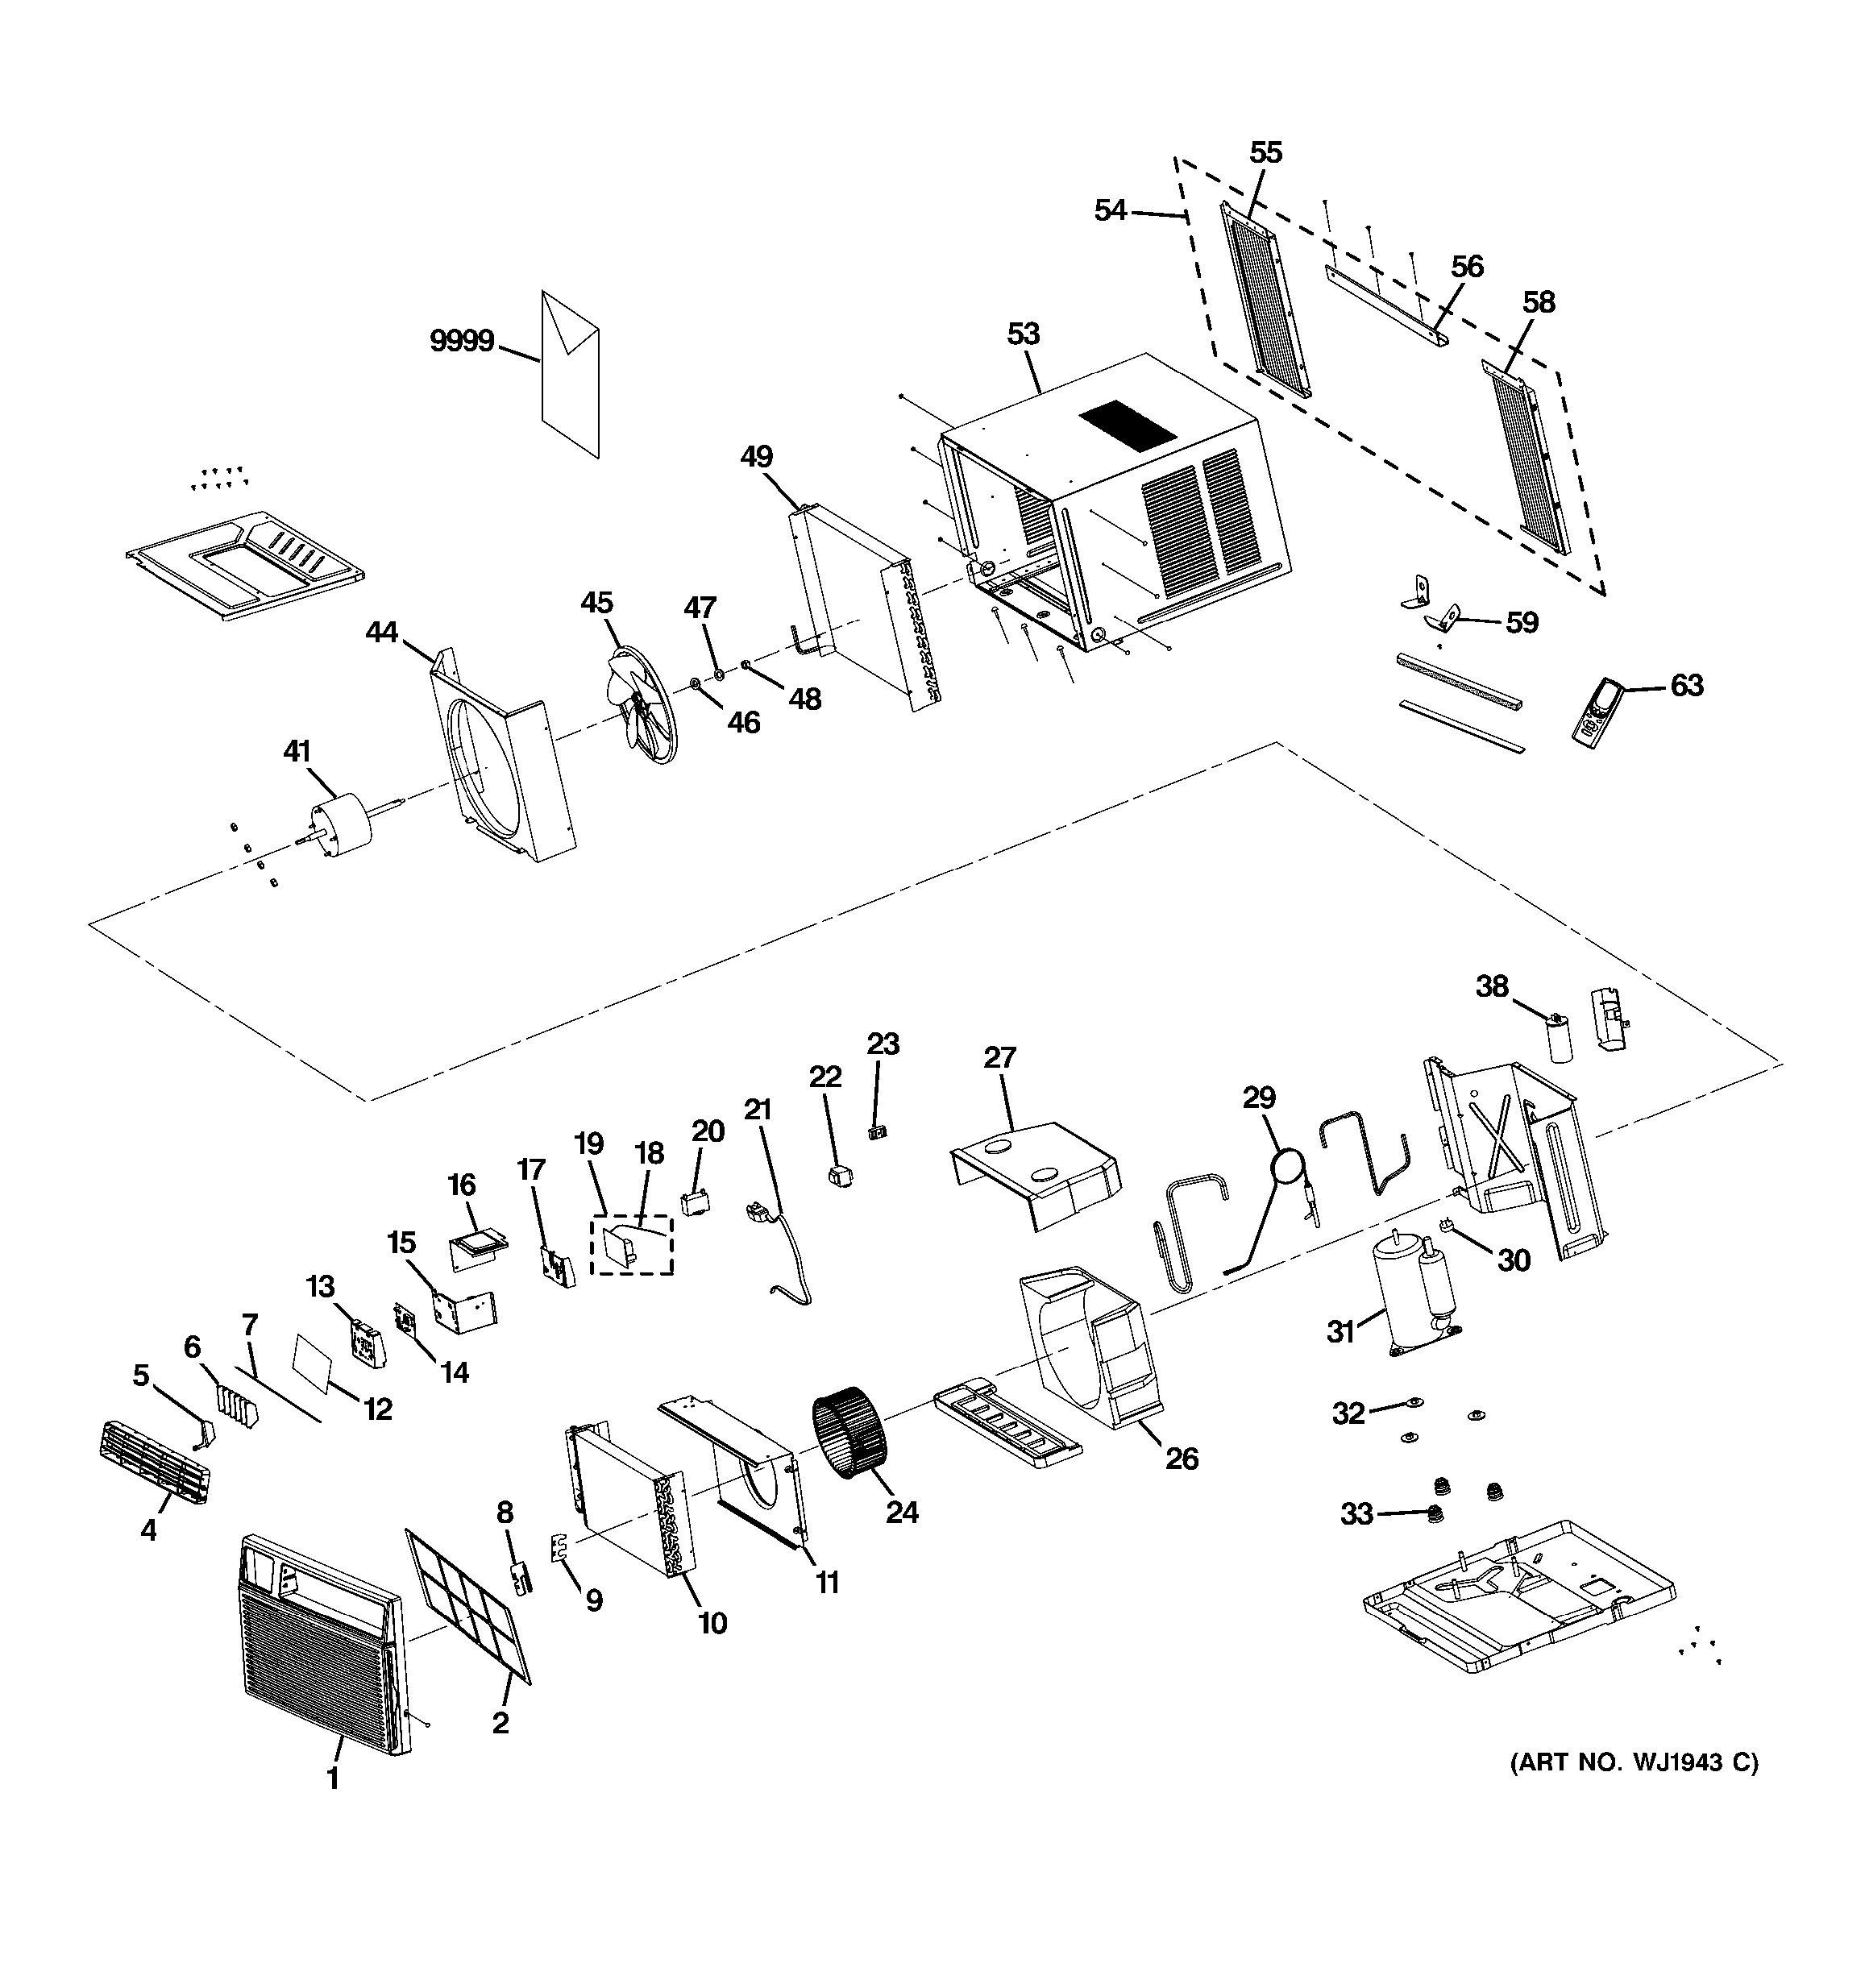 Ge Room Air Conditioner Parts Diagrams Wiring Diagram Images